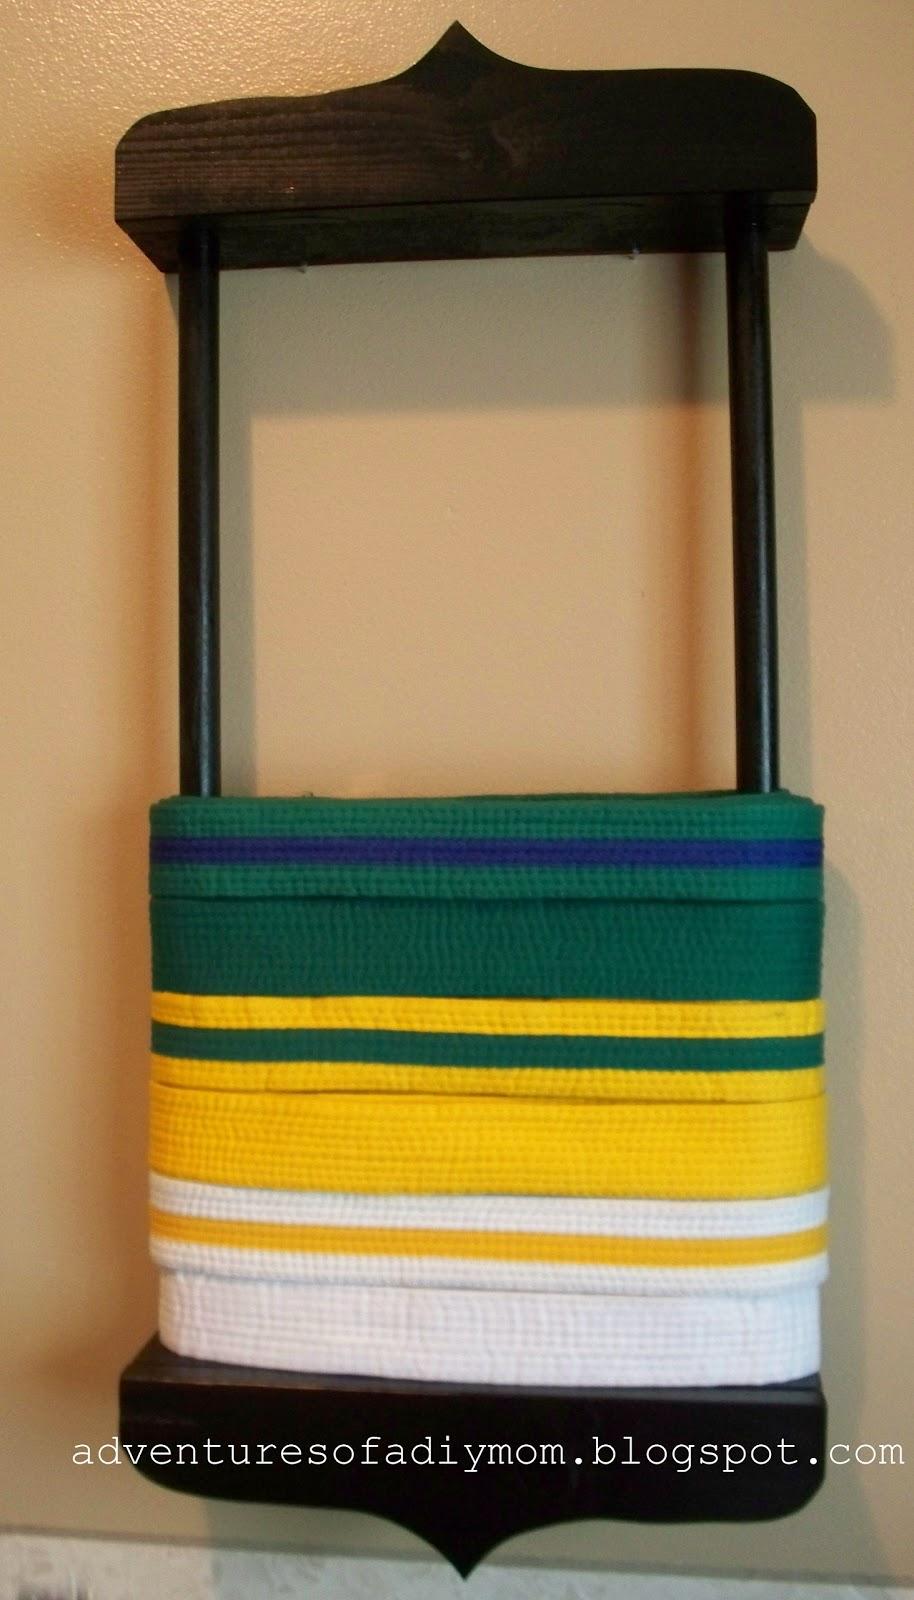 Karate belt display ideas - Karate Belt Display Ideas 8